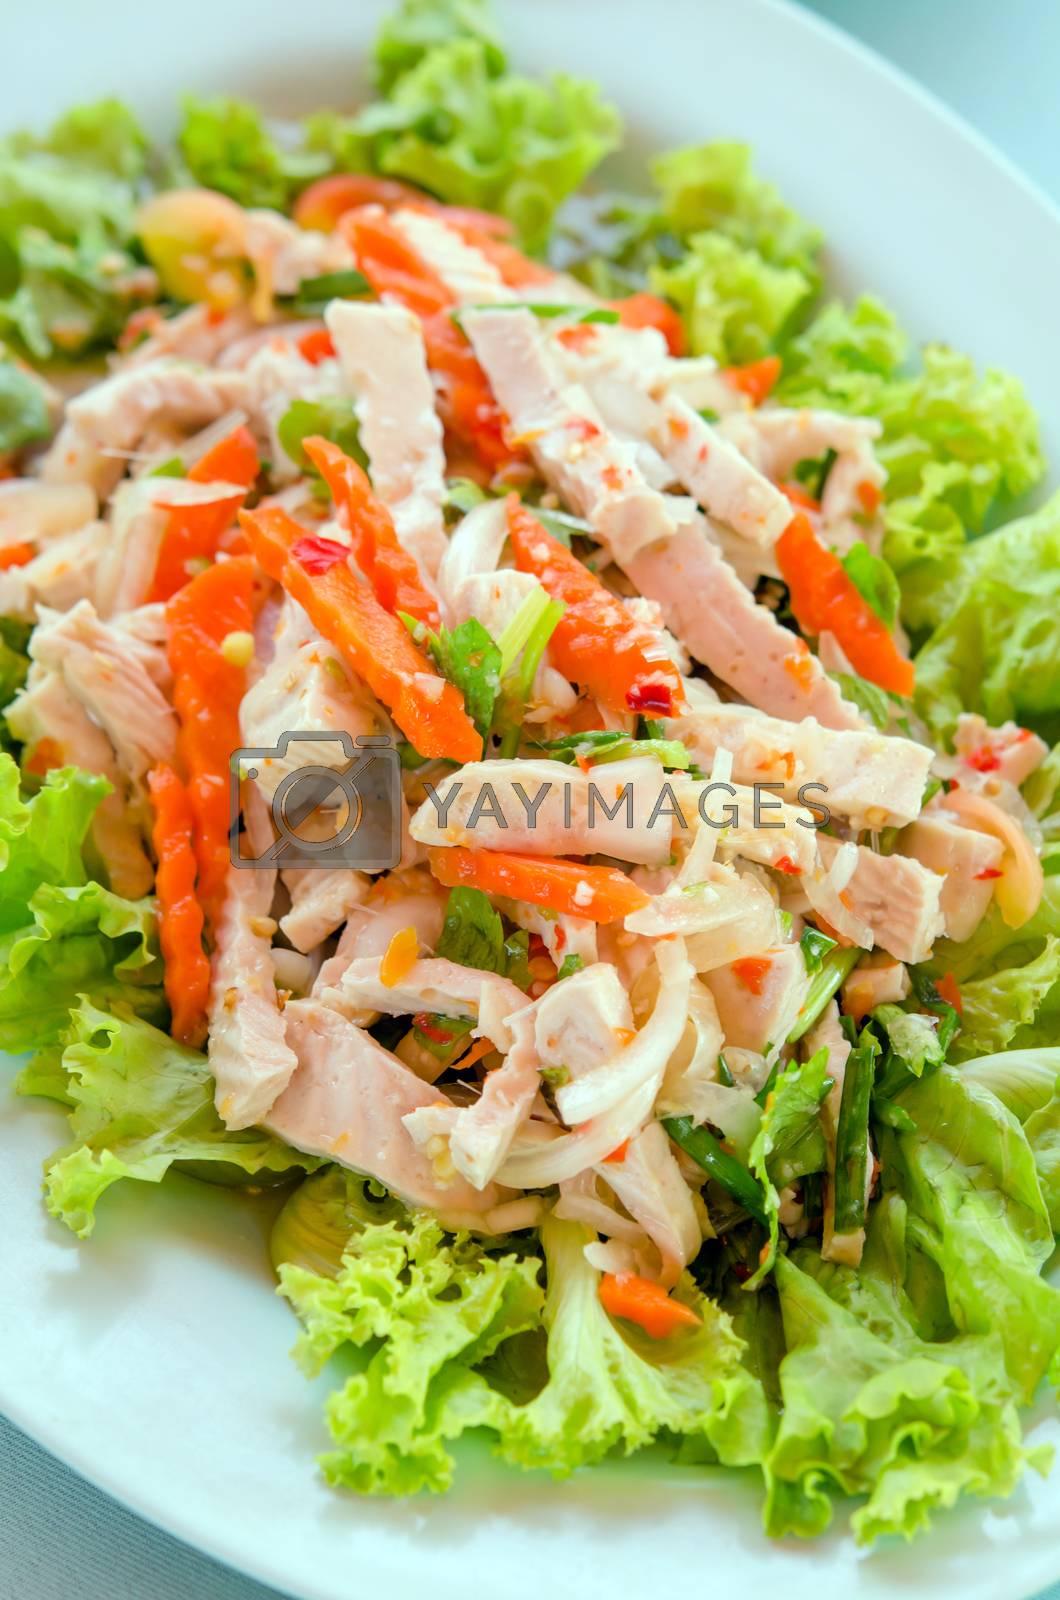 Royalty free image of sausage spicy salad by rakratchada